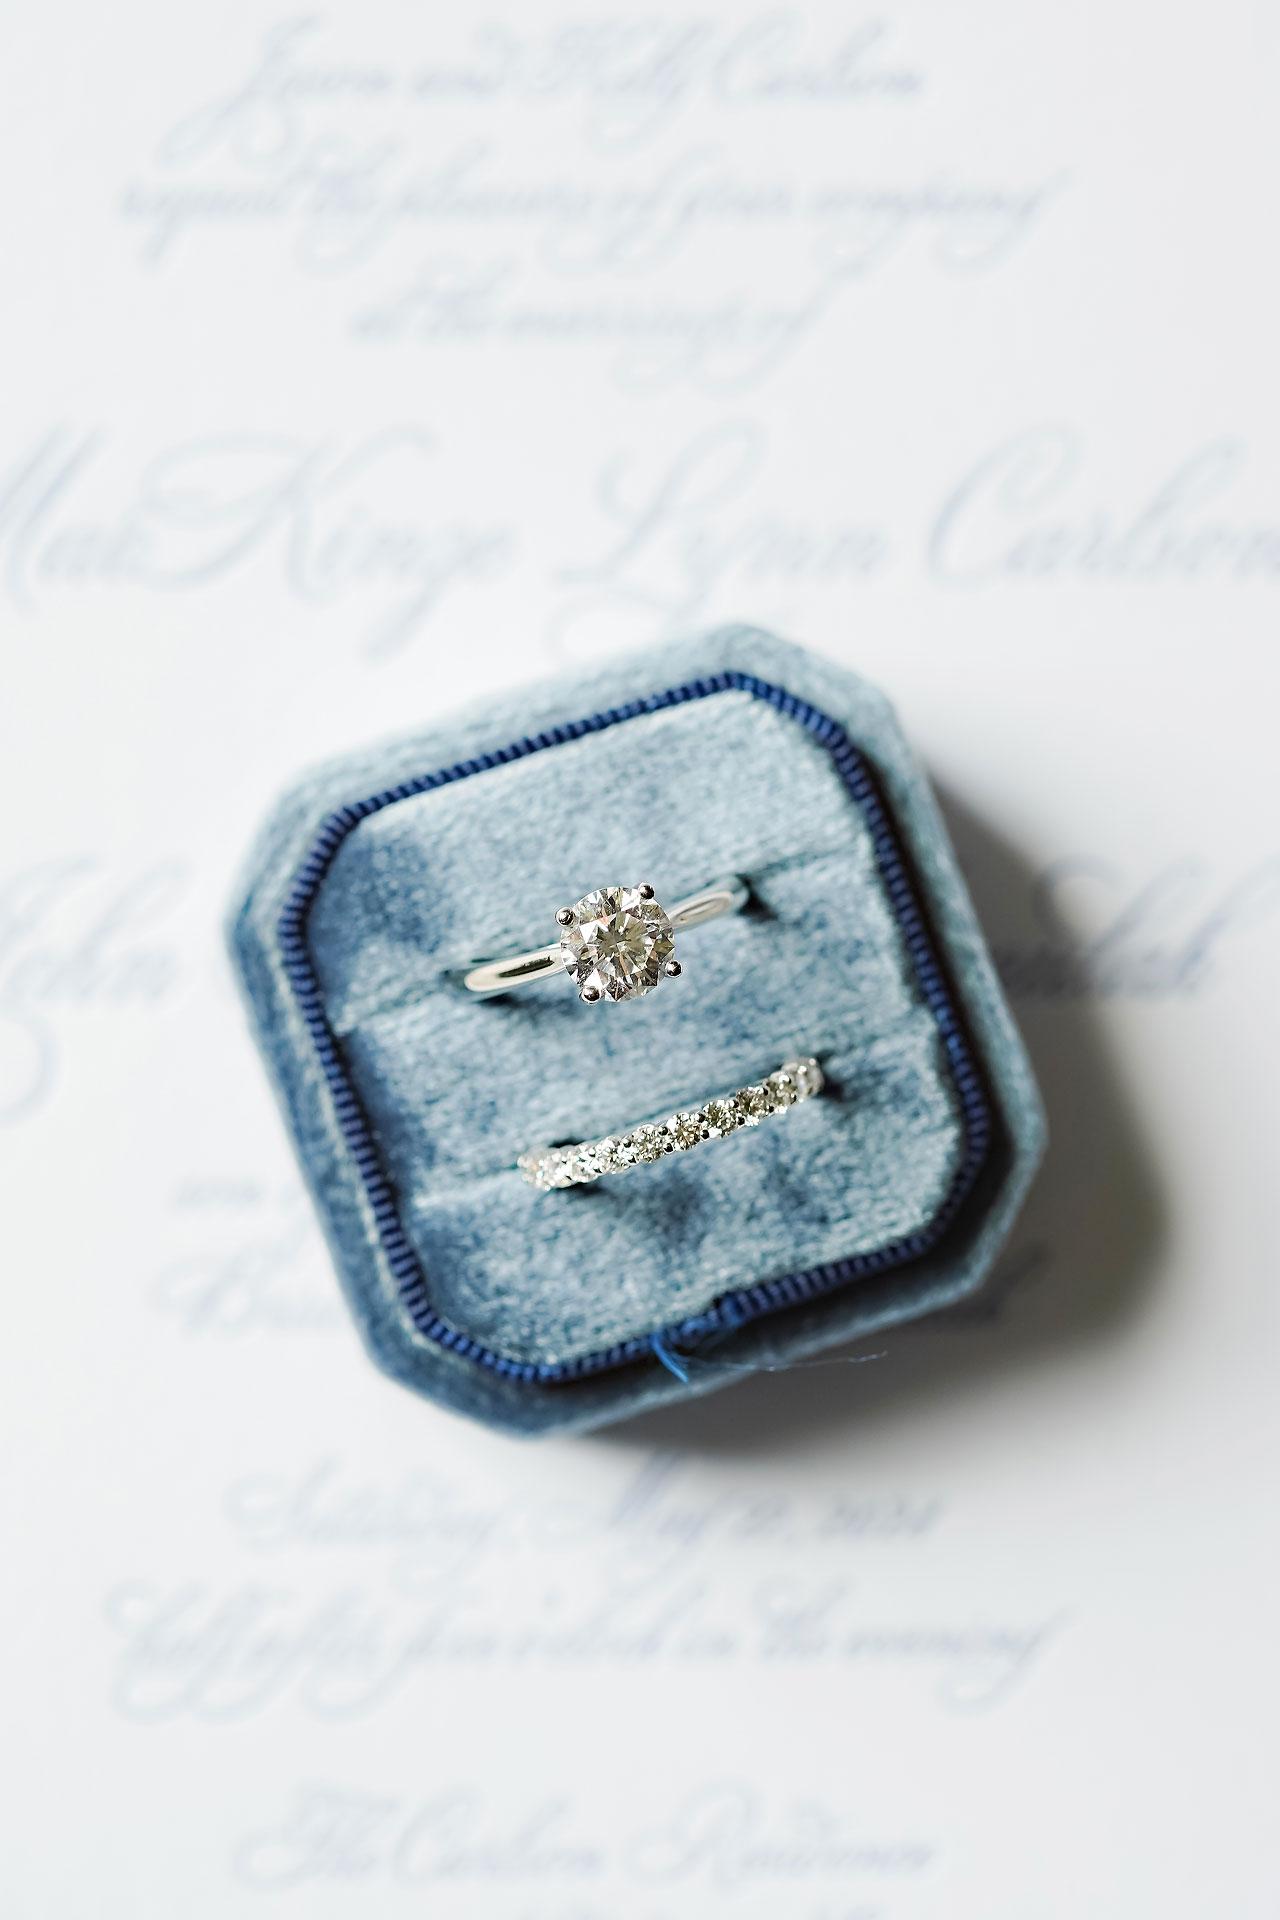 MacKinze John Lafayette Indiana Purdue Wedding 021